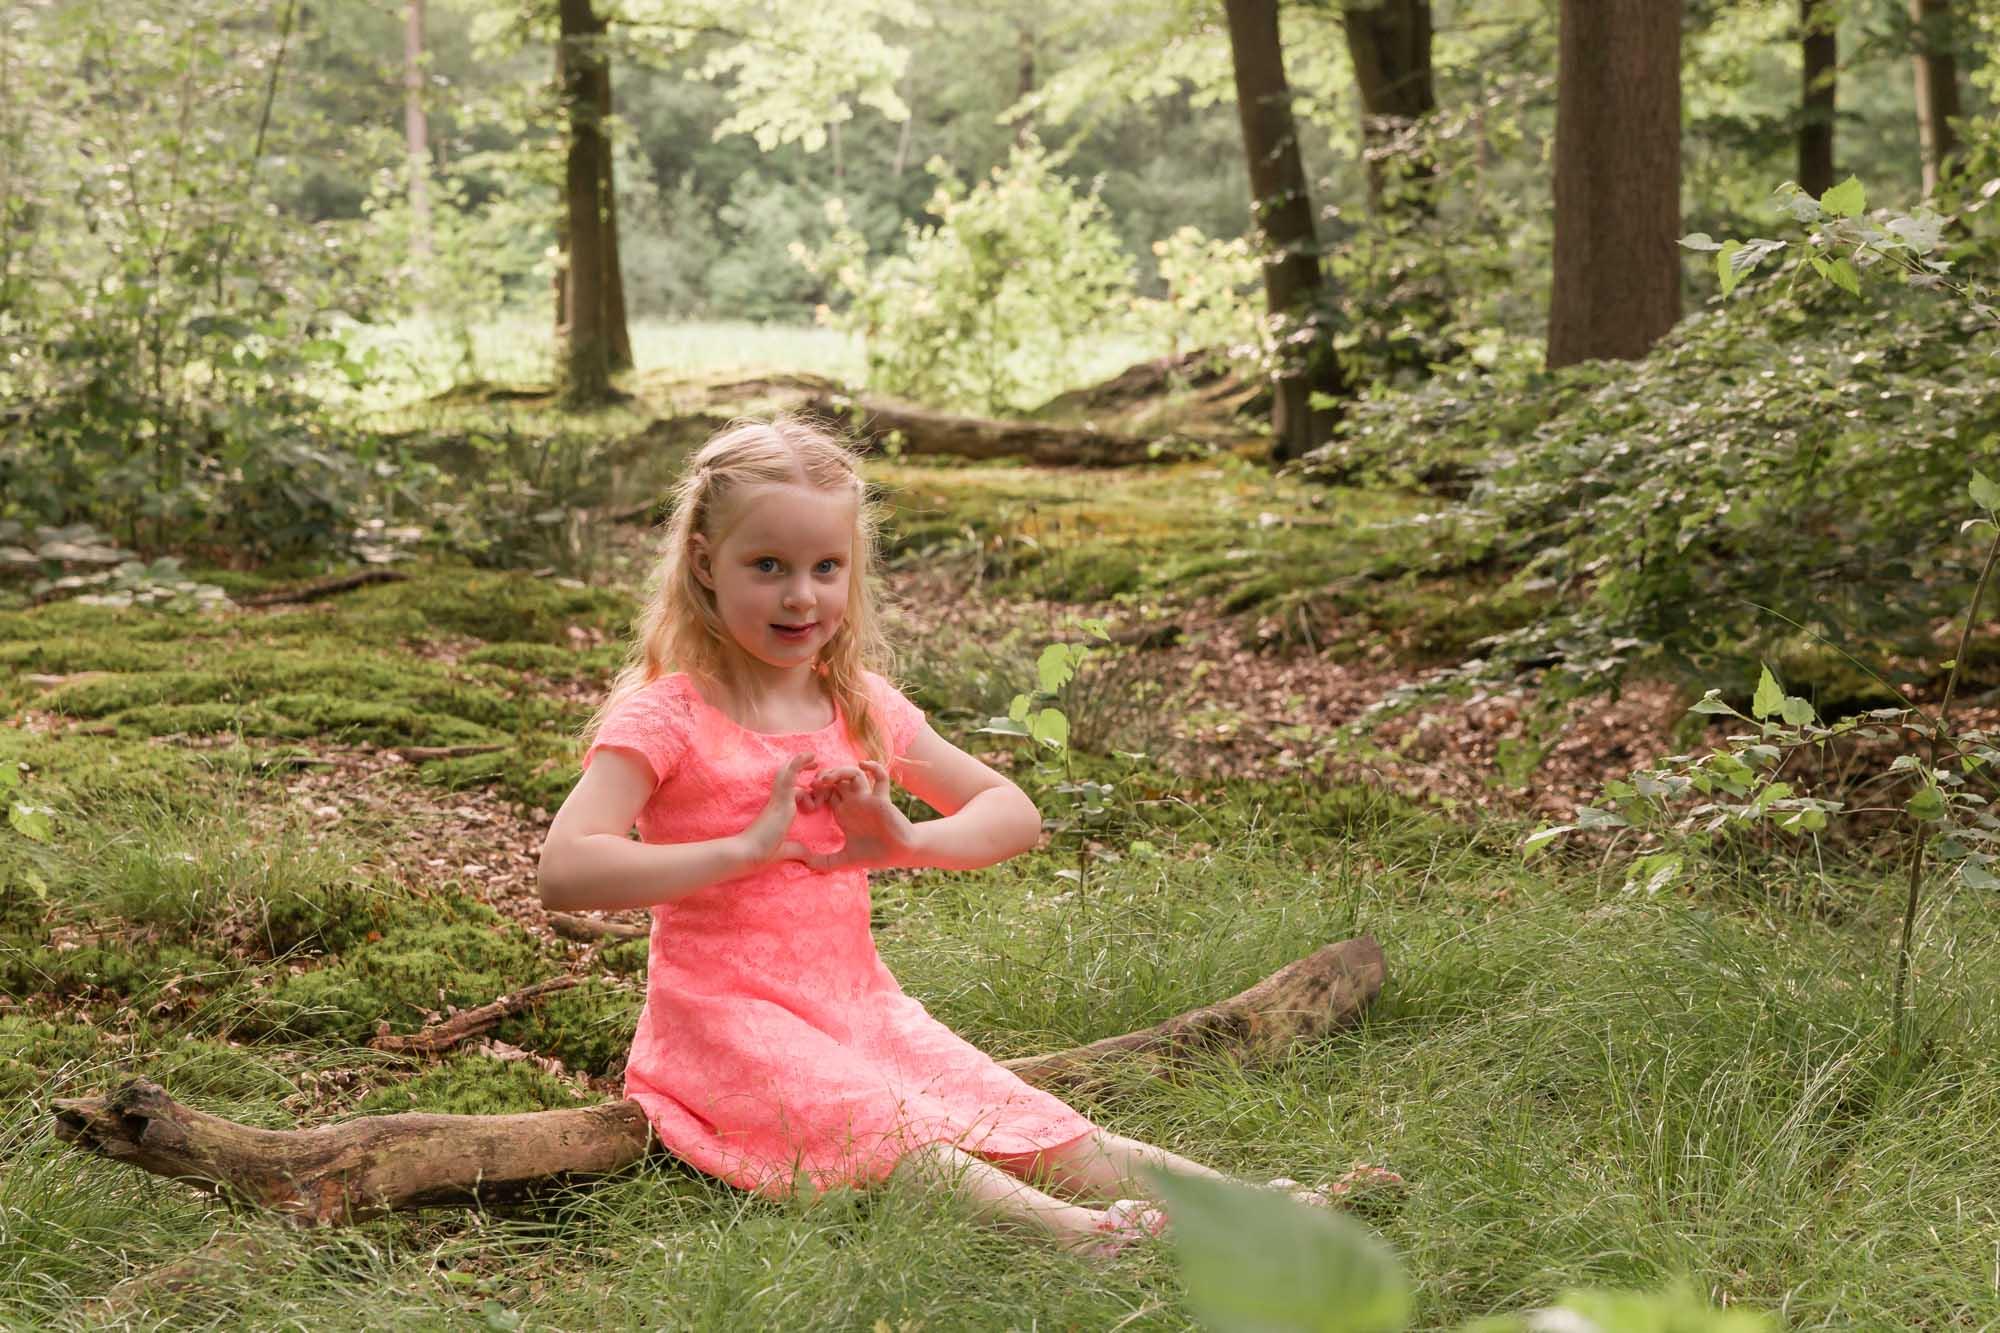 Kinder portretfotograaf in Amersfoort. Kinderportret door Mayra Fotografie. Kinder portret. Fotograaf Amersfoort. Fotograaf Nijkerk. Fotograaf Hoevelaken. Kinder fotoshoot